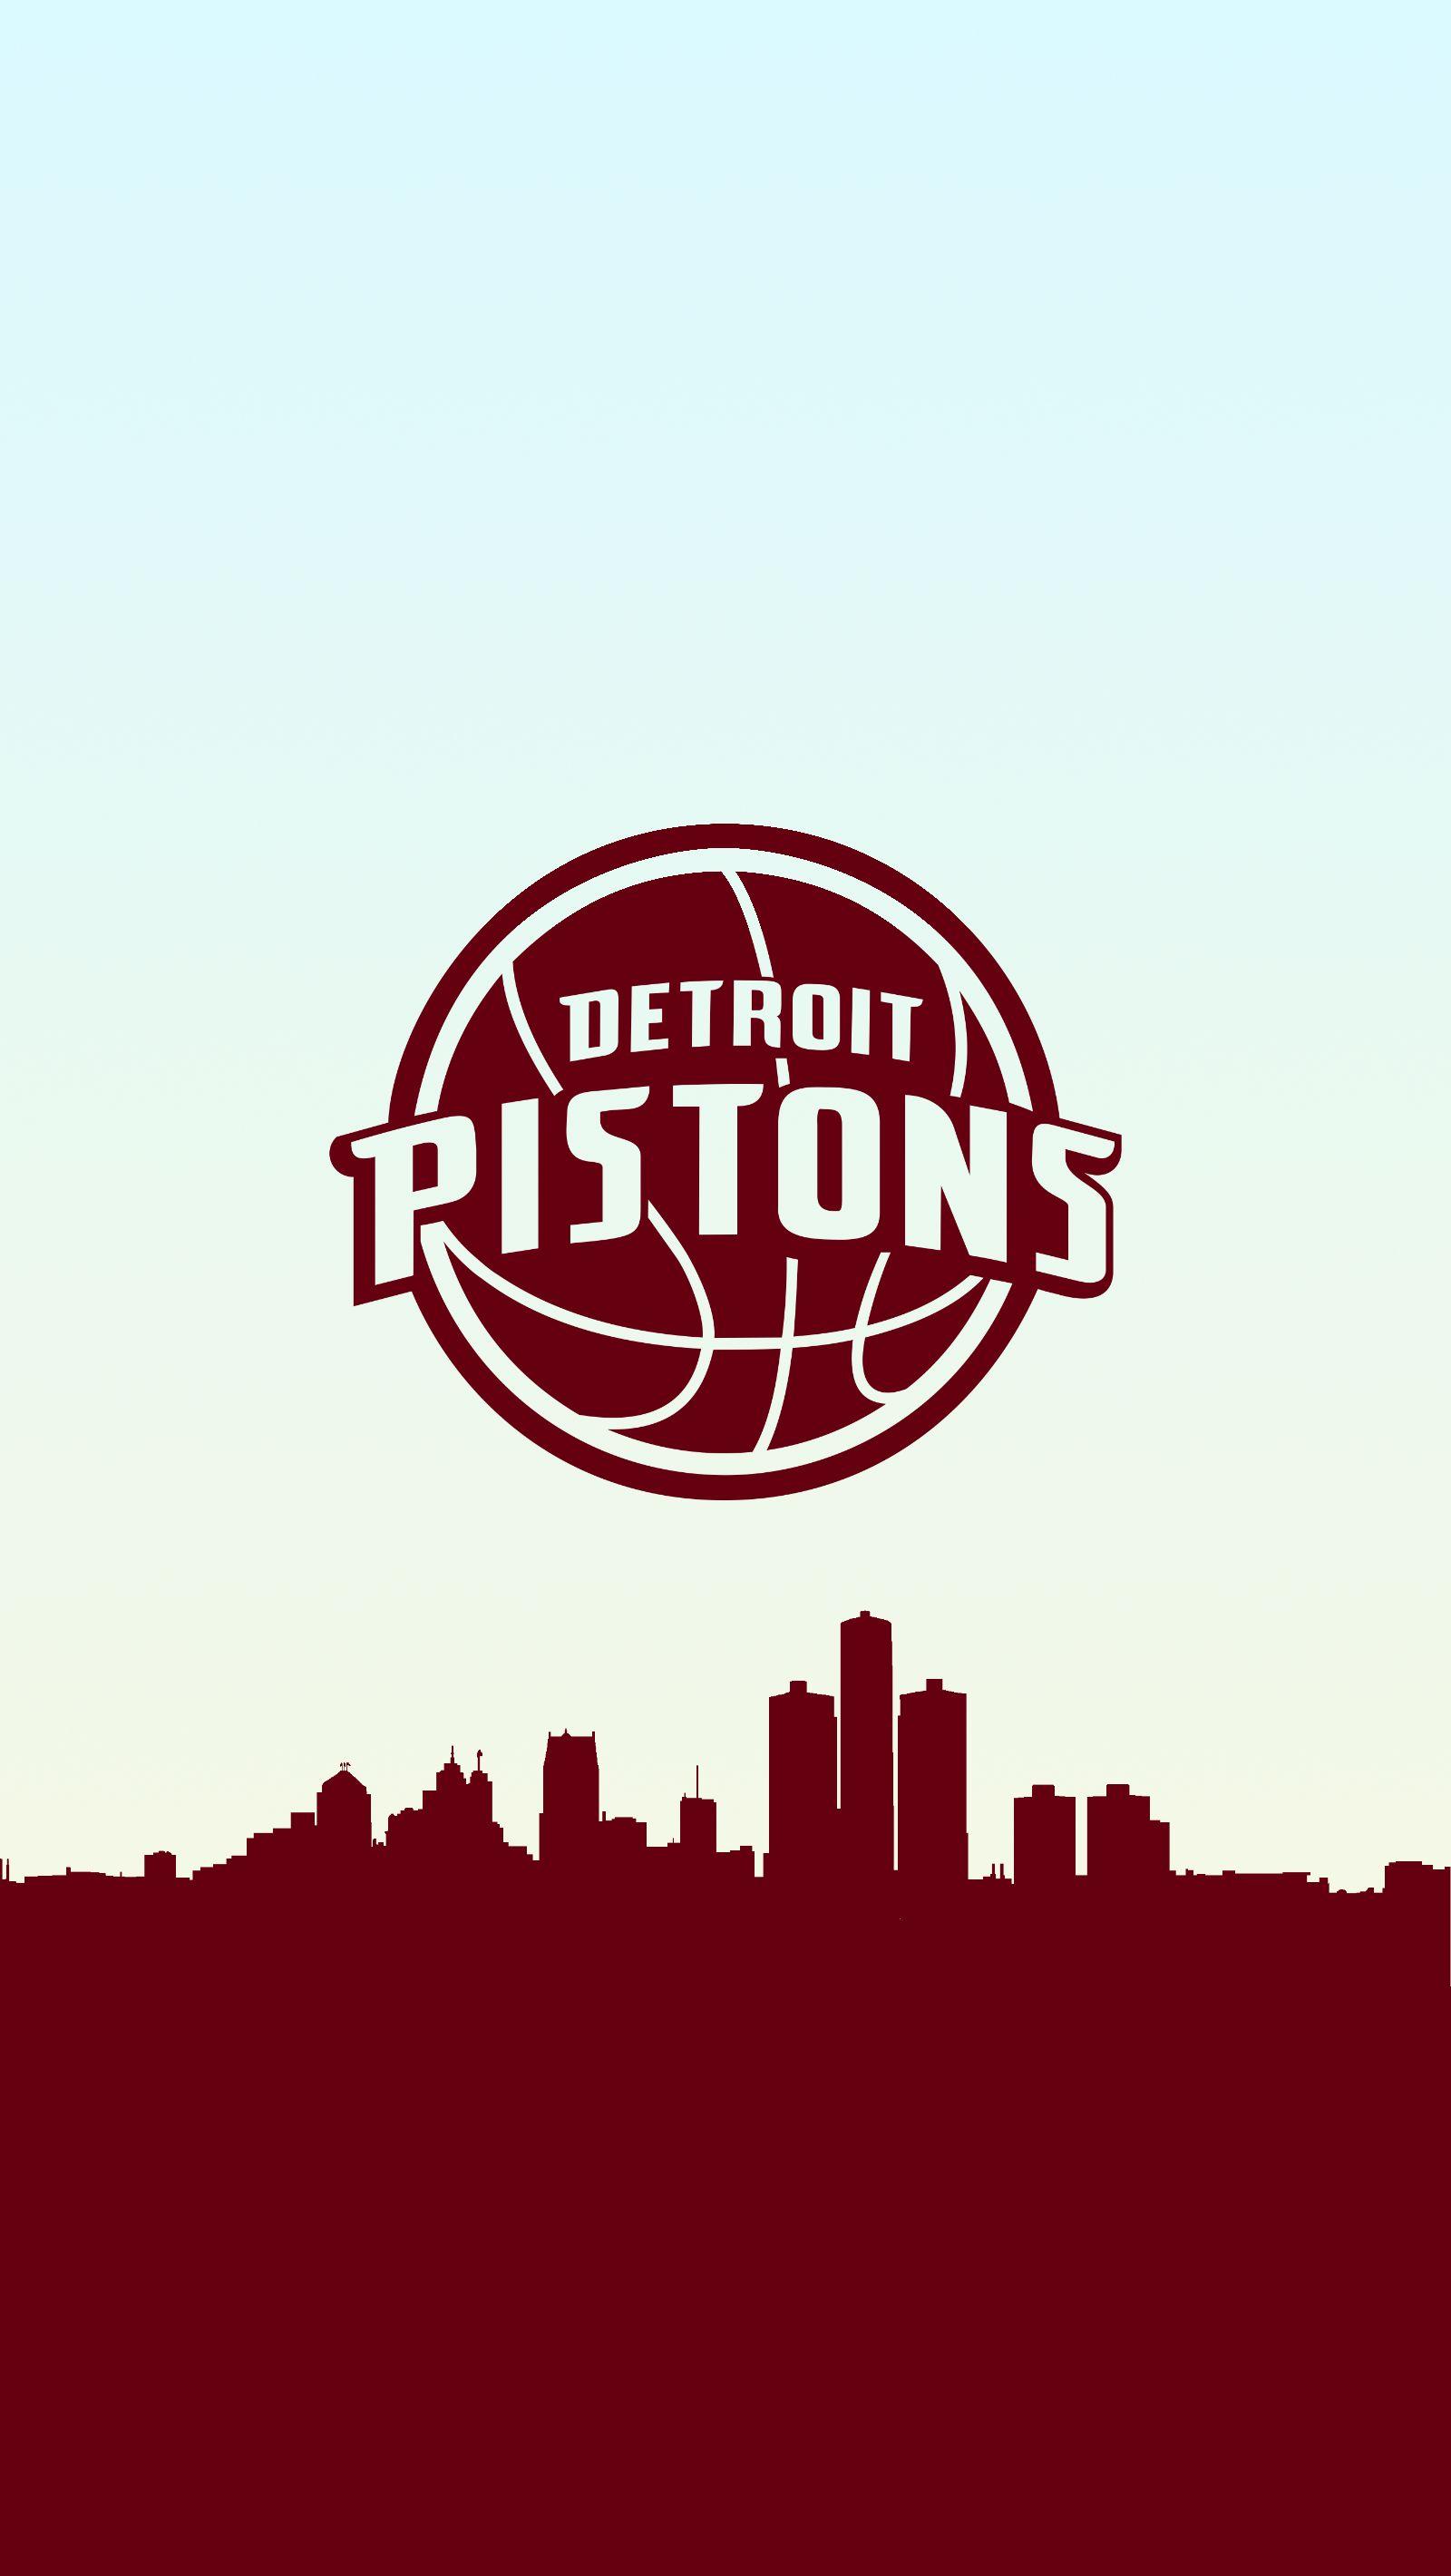 Detroit Pistons Basketball Phone Background Detroit Pistons Detroit Pistons Basketball Nba Basketball Teams